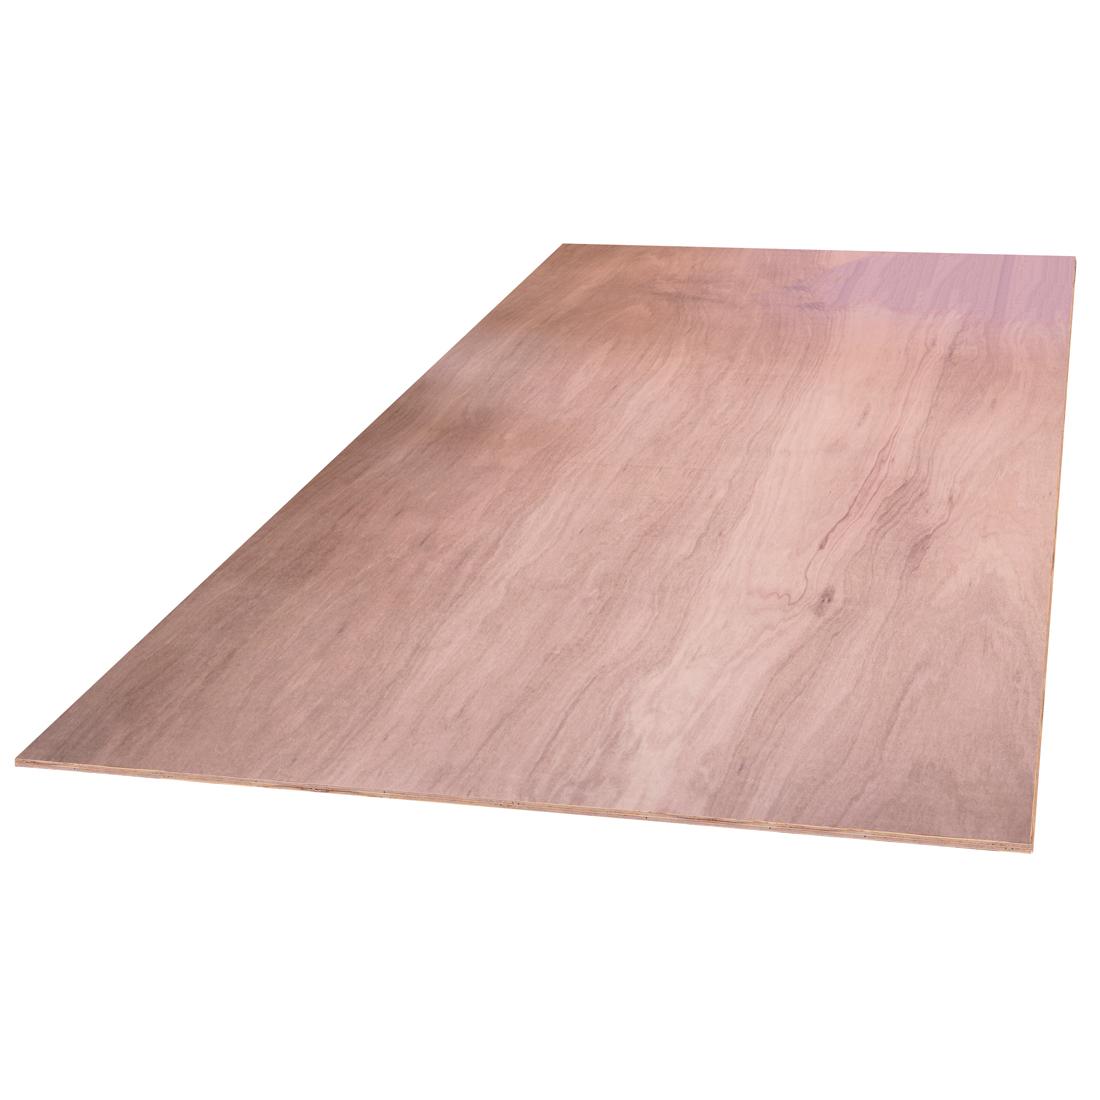 Redline Lining Plywood Untreated FSC 2400 x 1200mm x 12mm